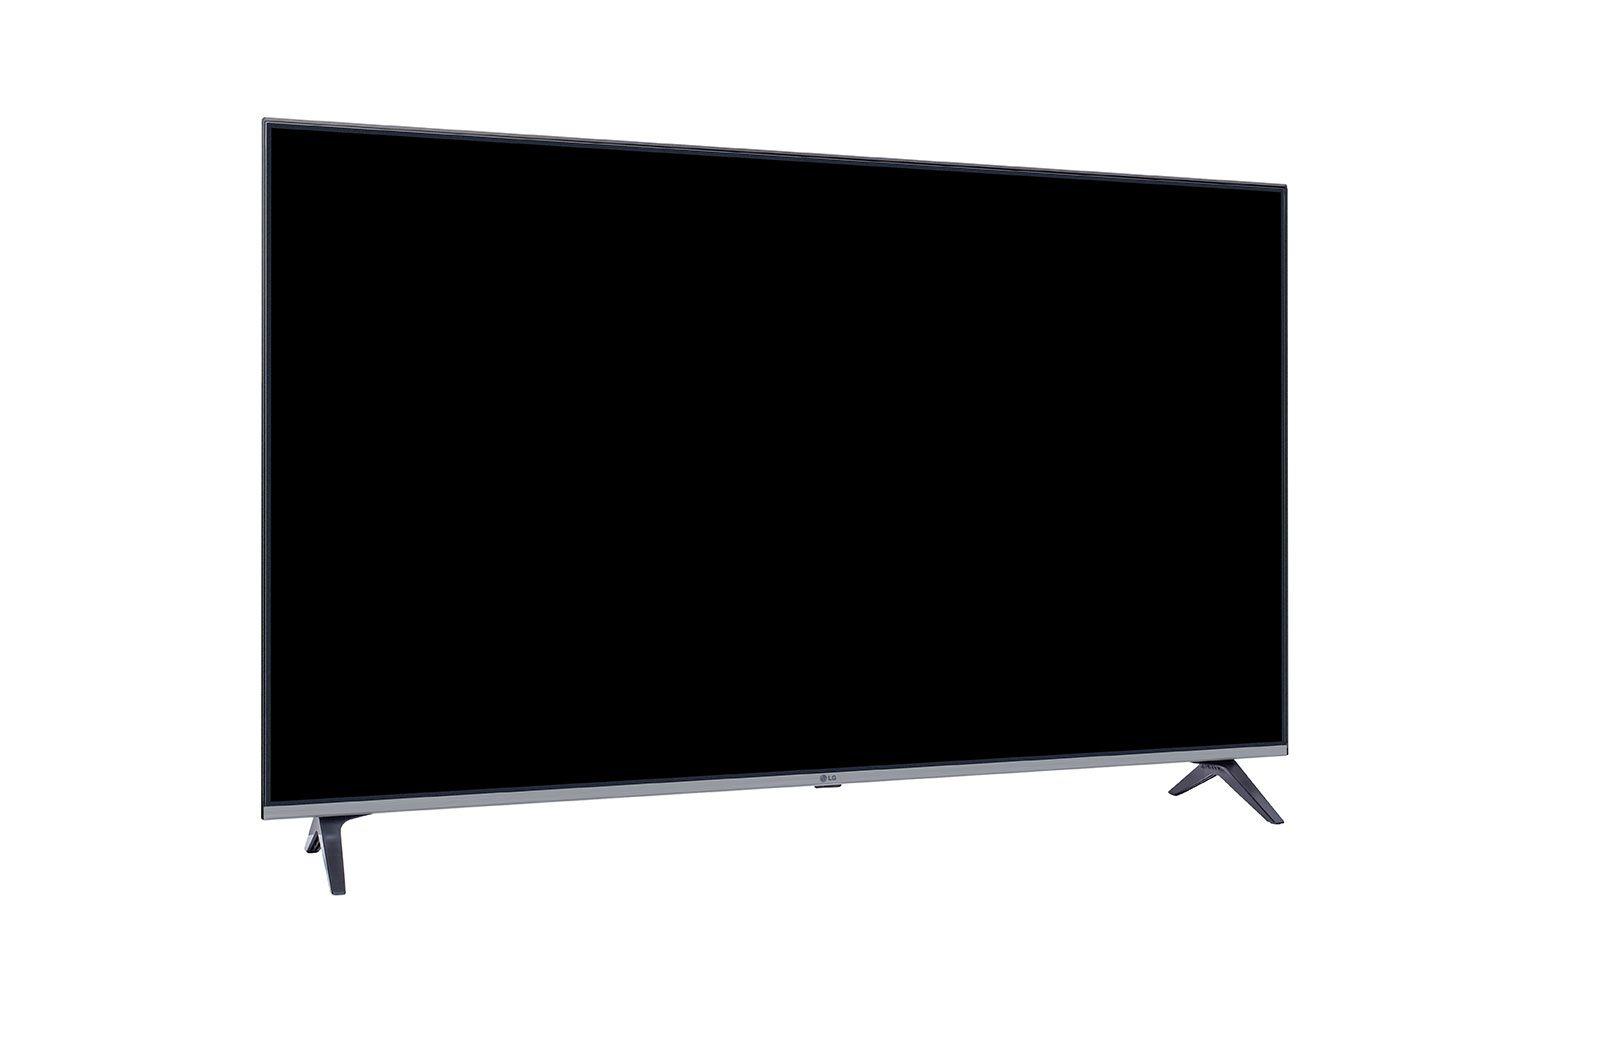 "Smart TV LED LG 55"" 4K 55UM7520PSB com ThinQ AI Inteligência Artificial, IPS, Quad Core, HDR Ativo, DTS Virtual X, WebOS 4.5, Bluetooth e HDMI"